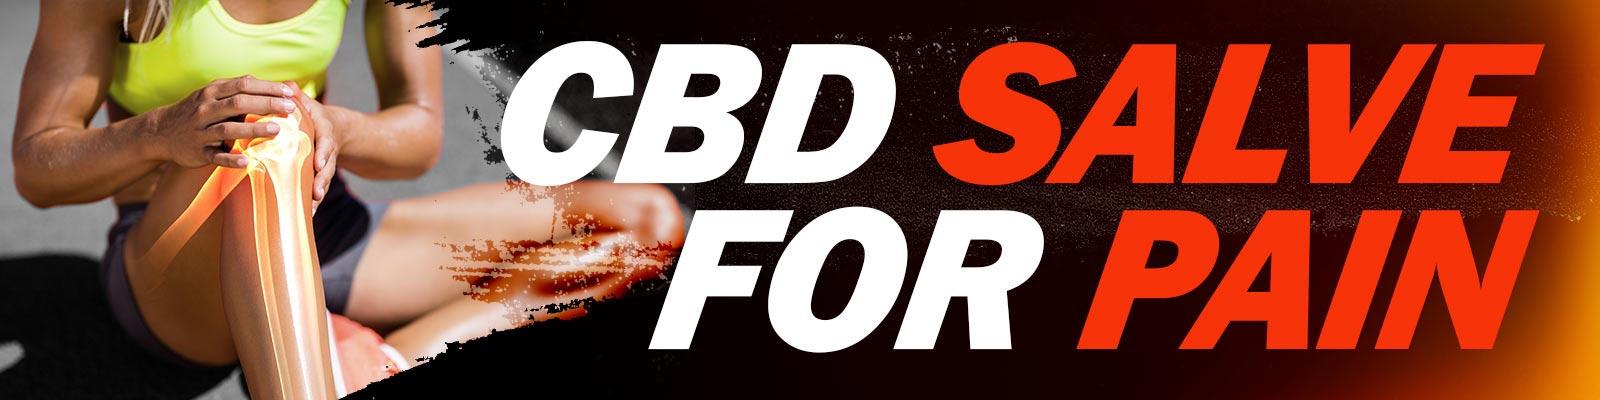 Hemp Bombs CBD Salve for pain two people applying CBD Pain Freeze